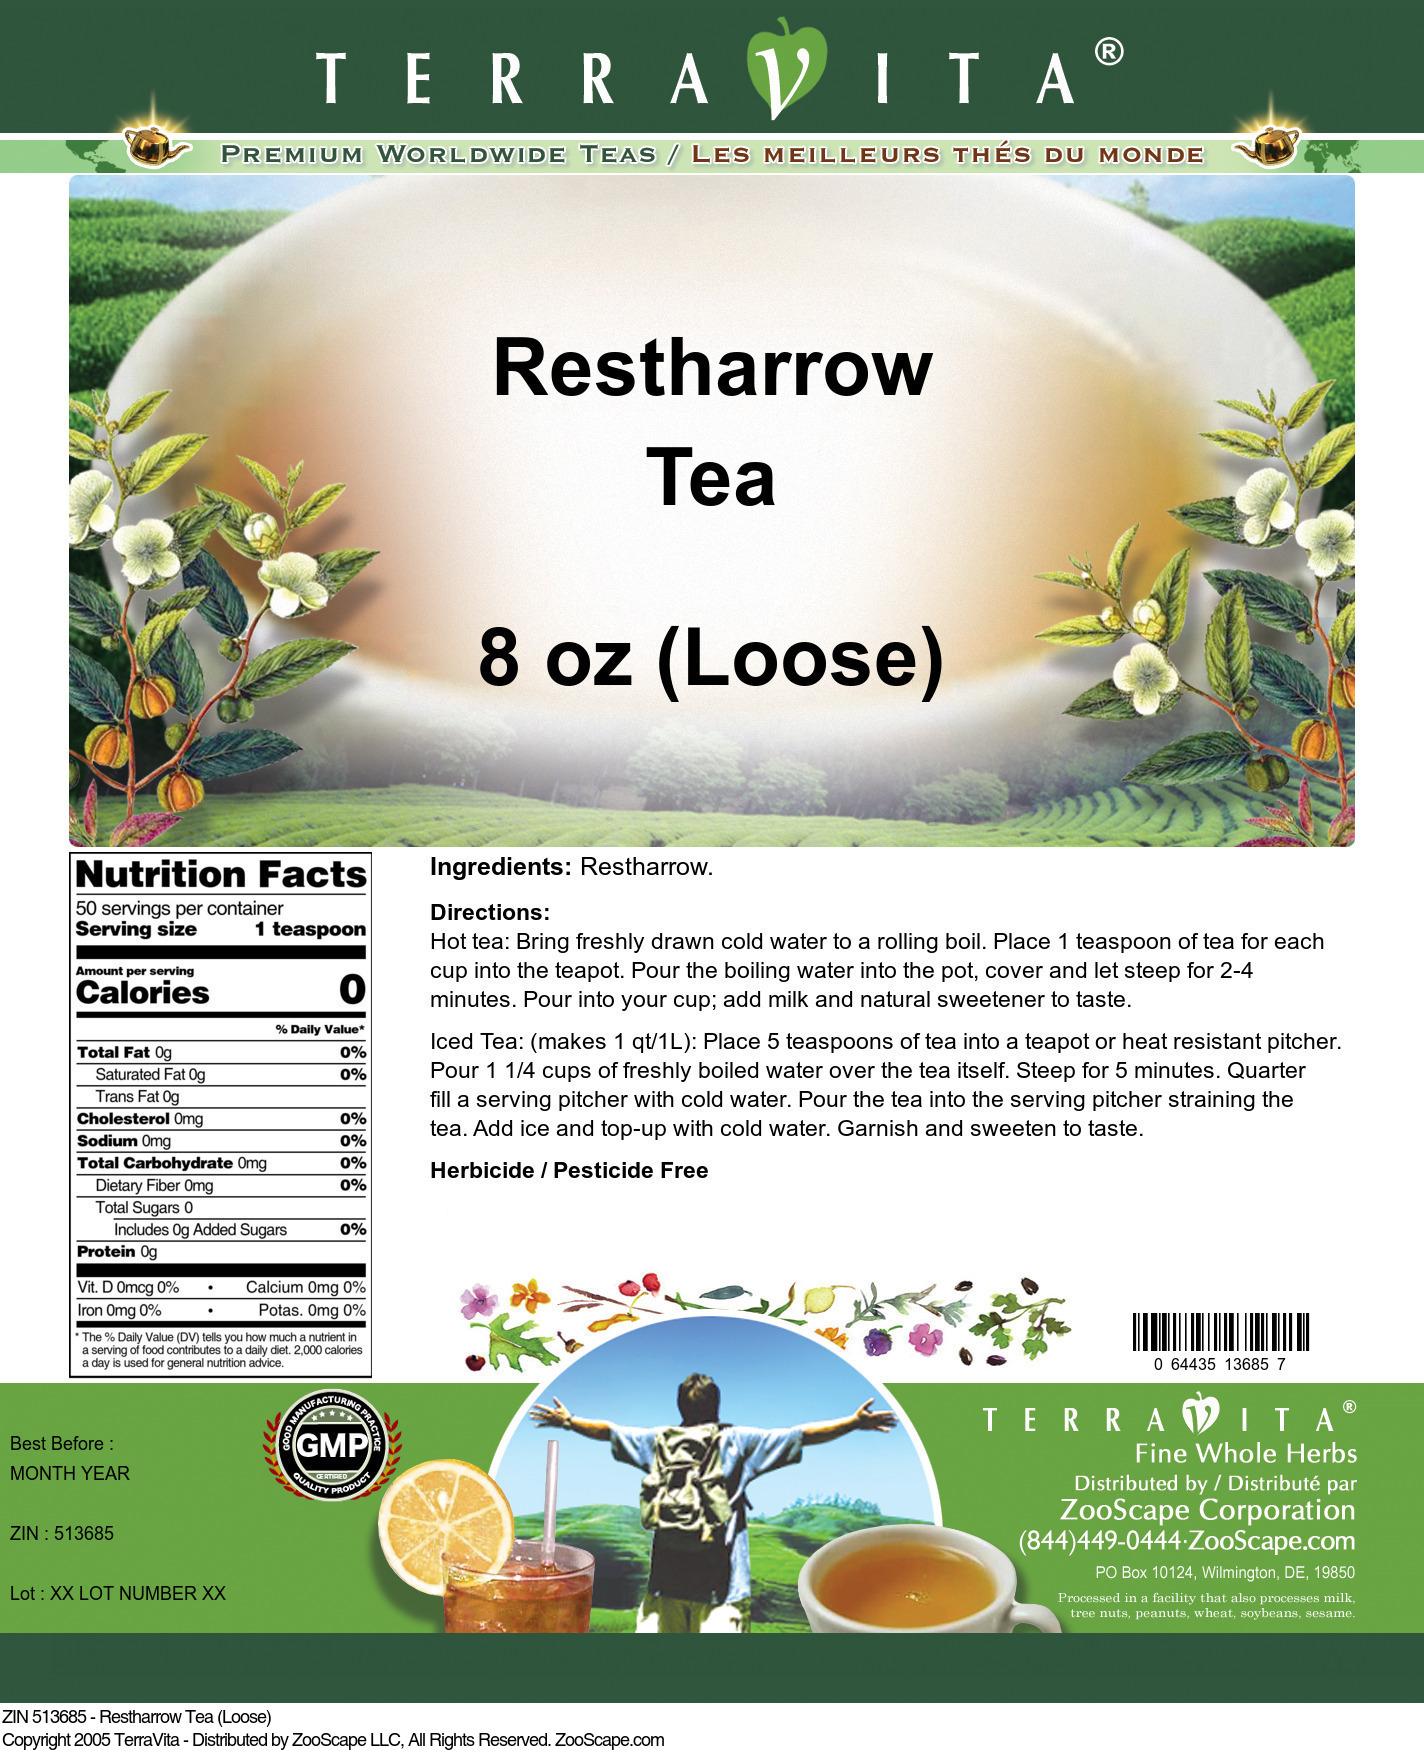 Restharrow Tea (Loose)